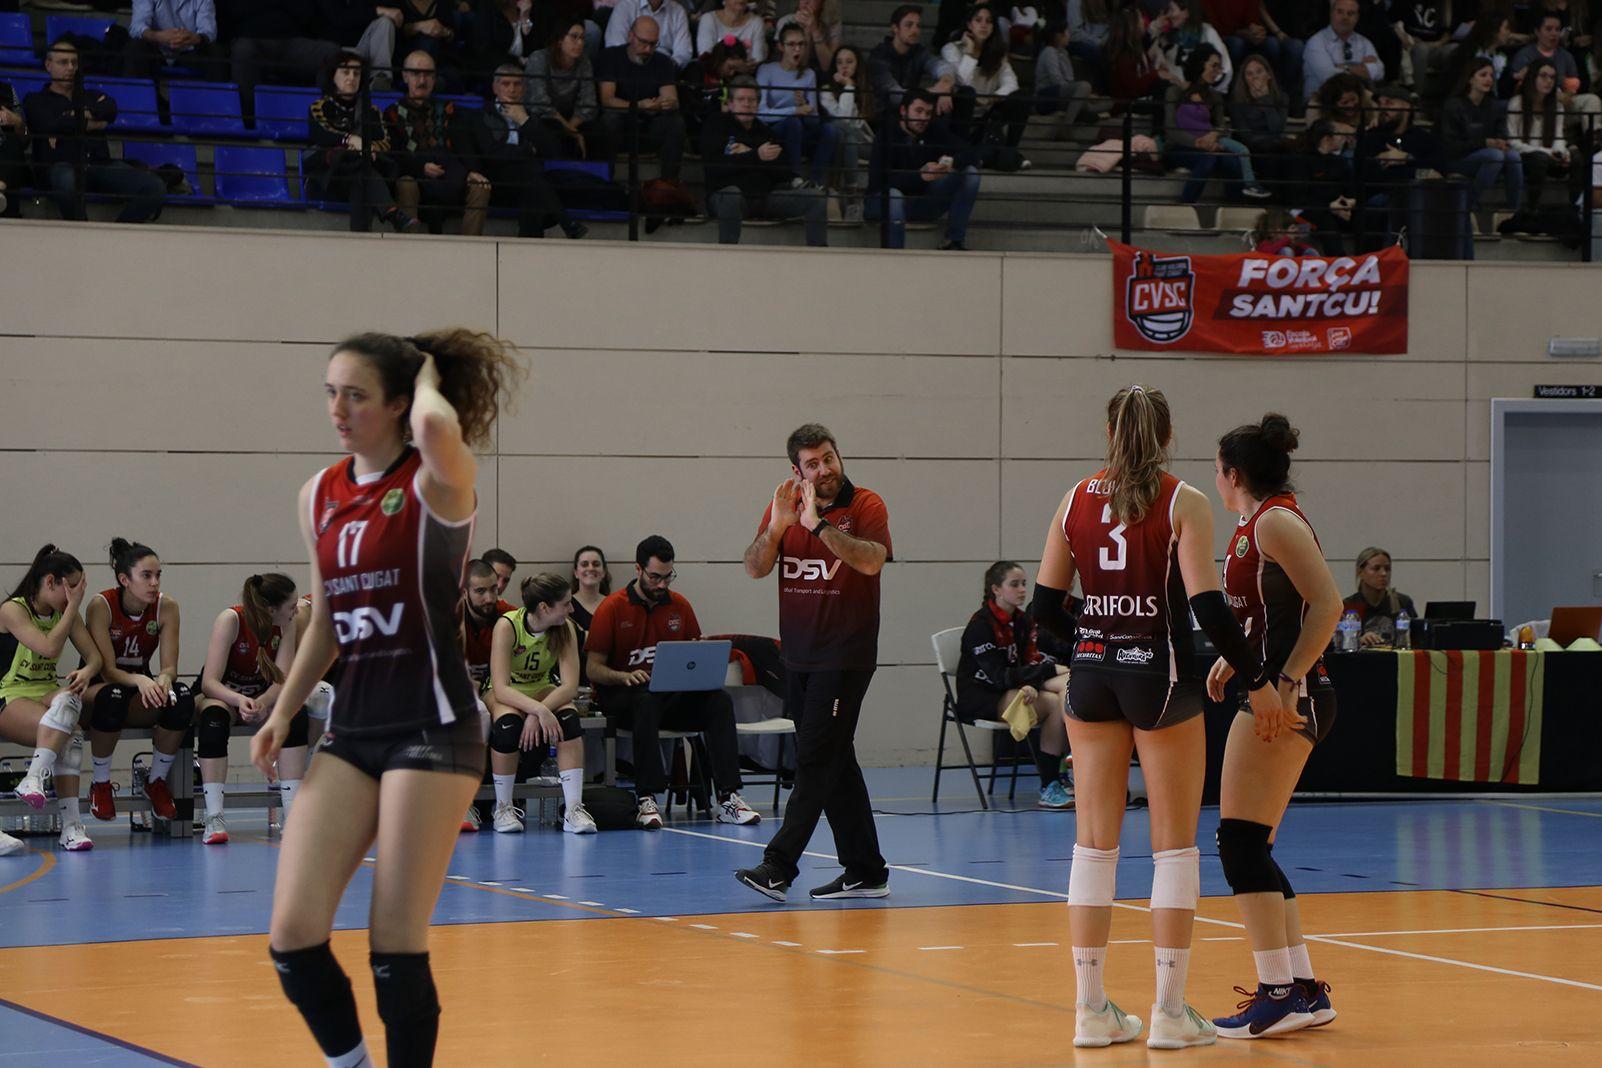 Partit de lliga voleibol femení CV Sant Cugat-CVB Barça. FOTO: Anna Bassa